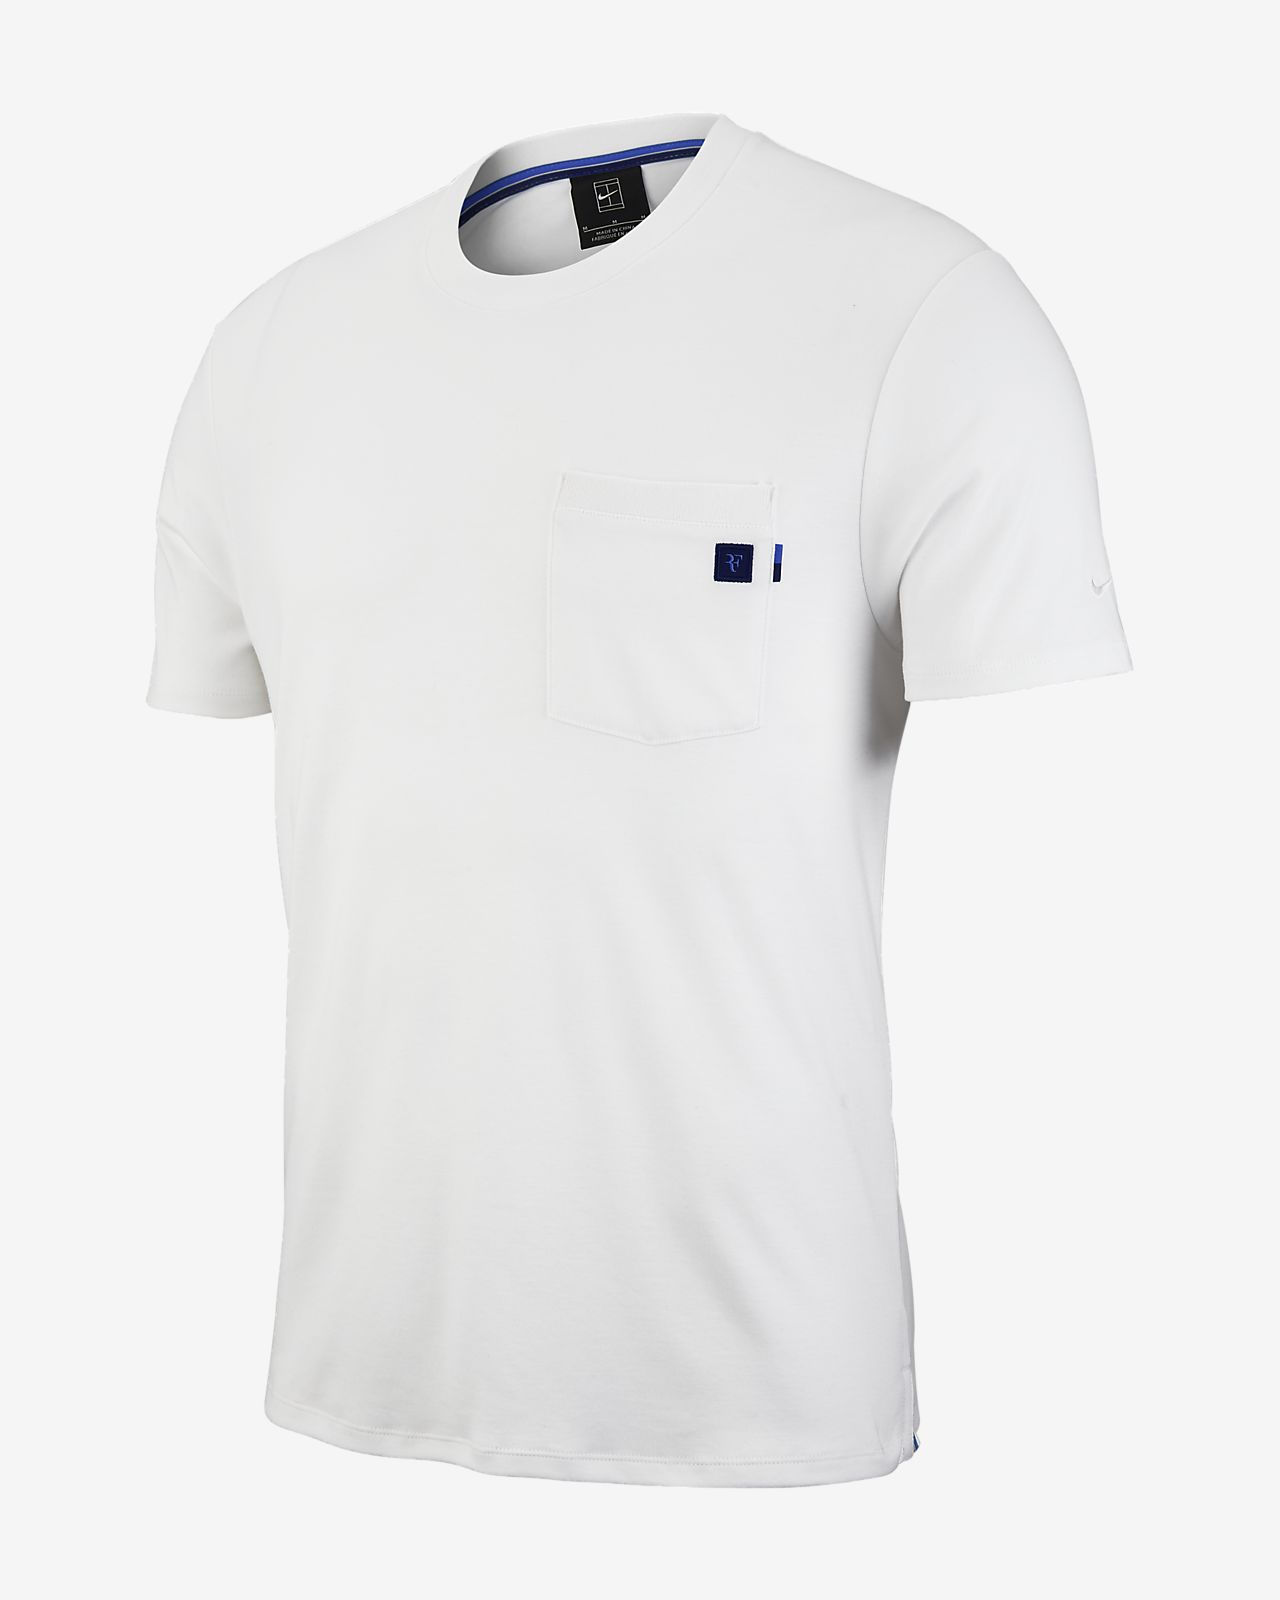 Para hombres Nike Air Max Manga Corta Cuello Redondo De La Camiseta Algodón  Deporte Fitness Casual 727fe0add51